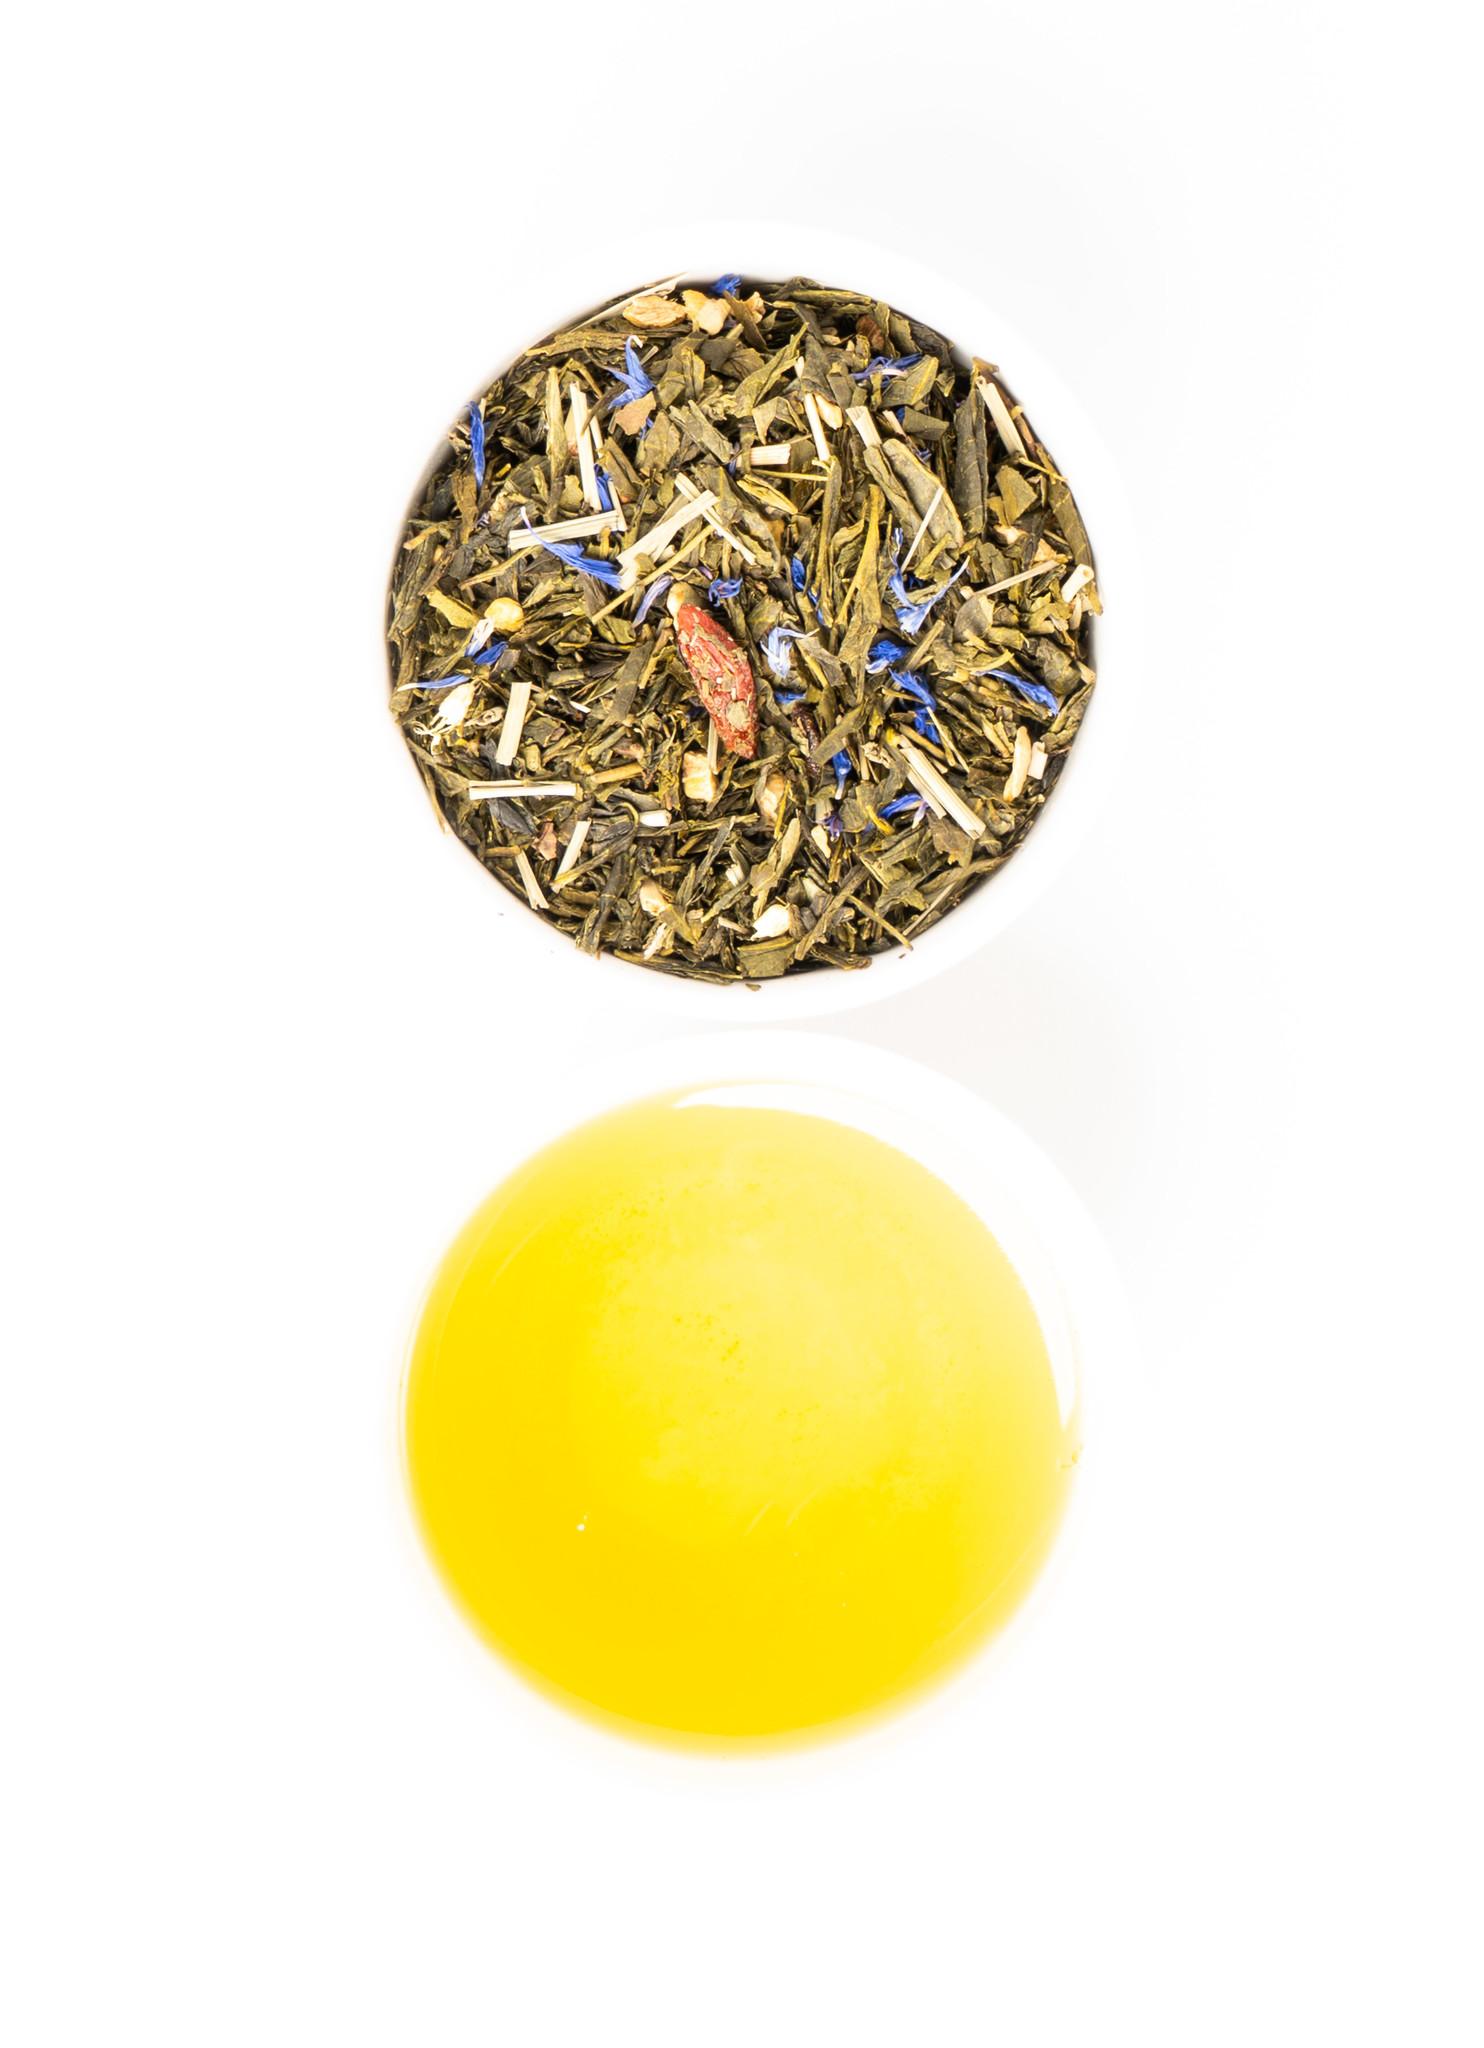 Green Oxi-Goji - green tea with goji berries